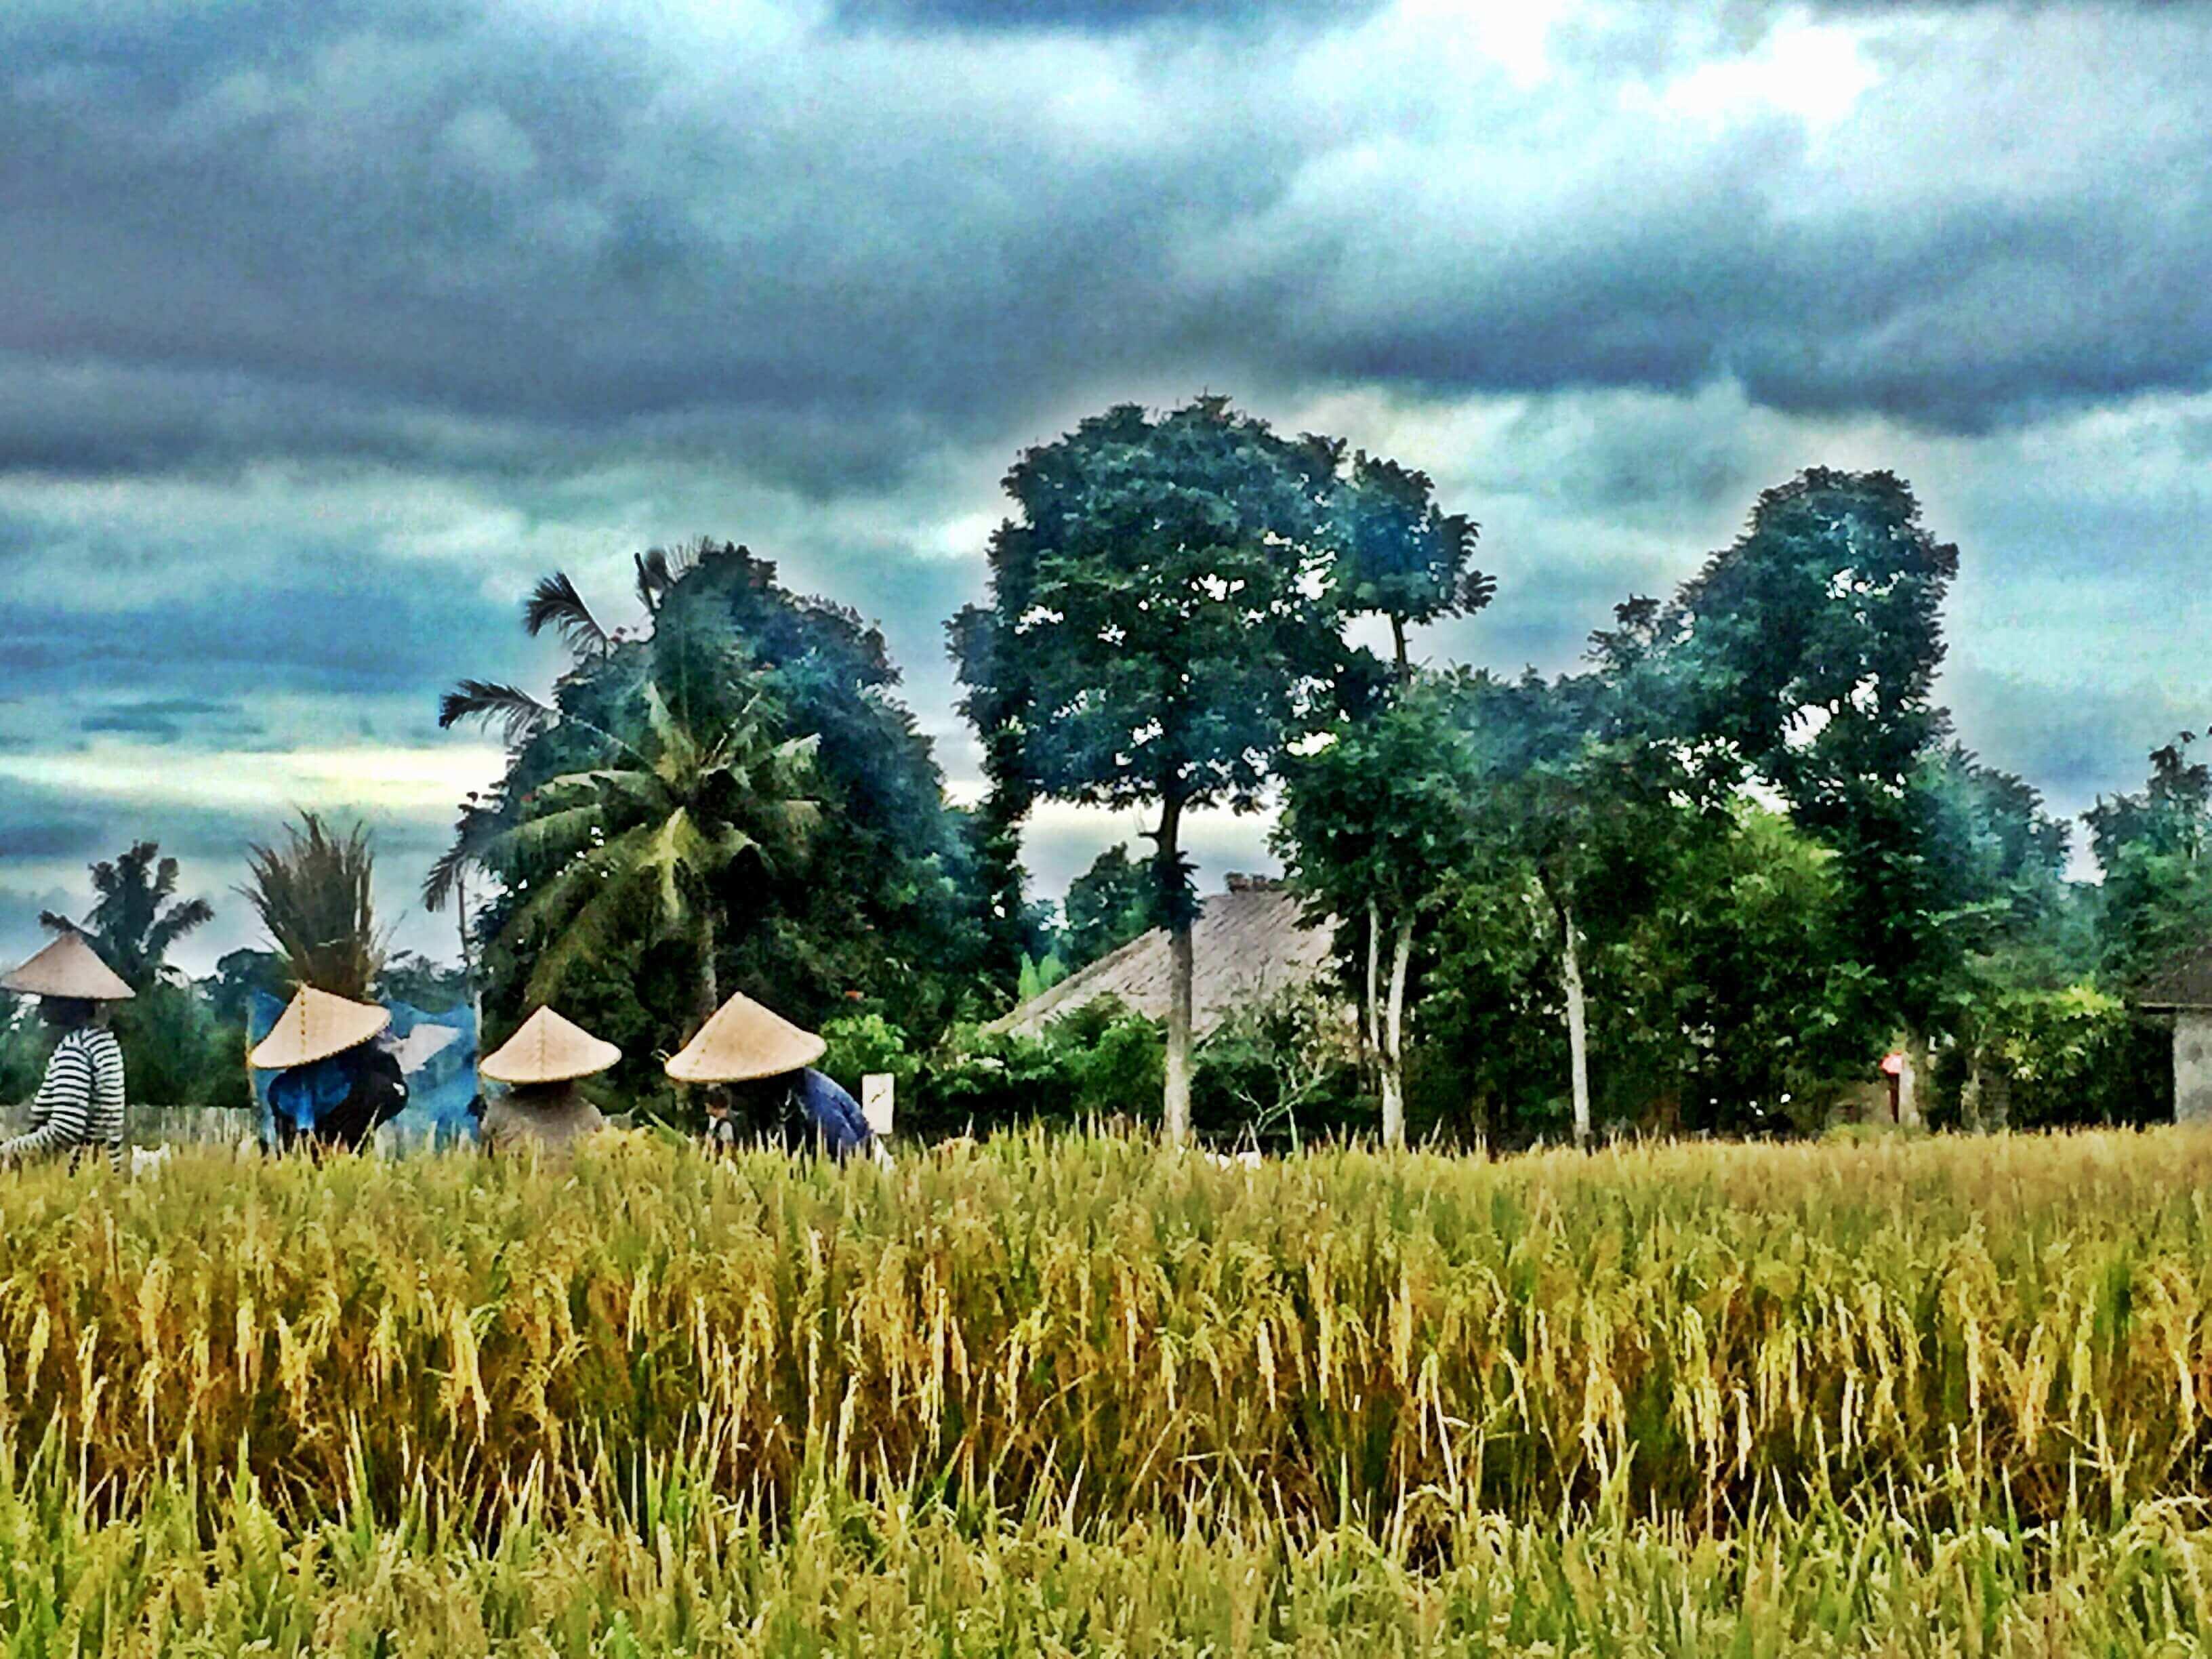 Annaway-Bali-Ubud-Reisfeld-Blog